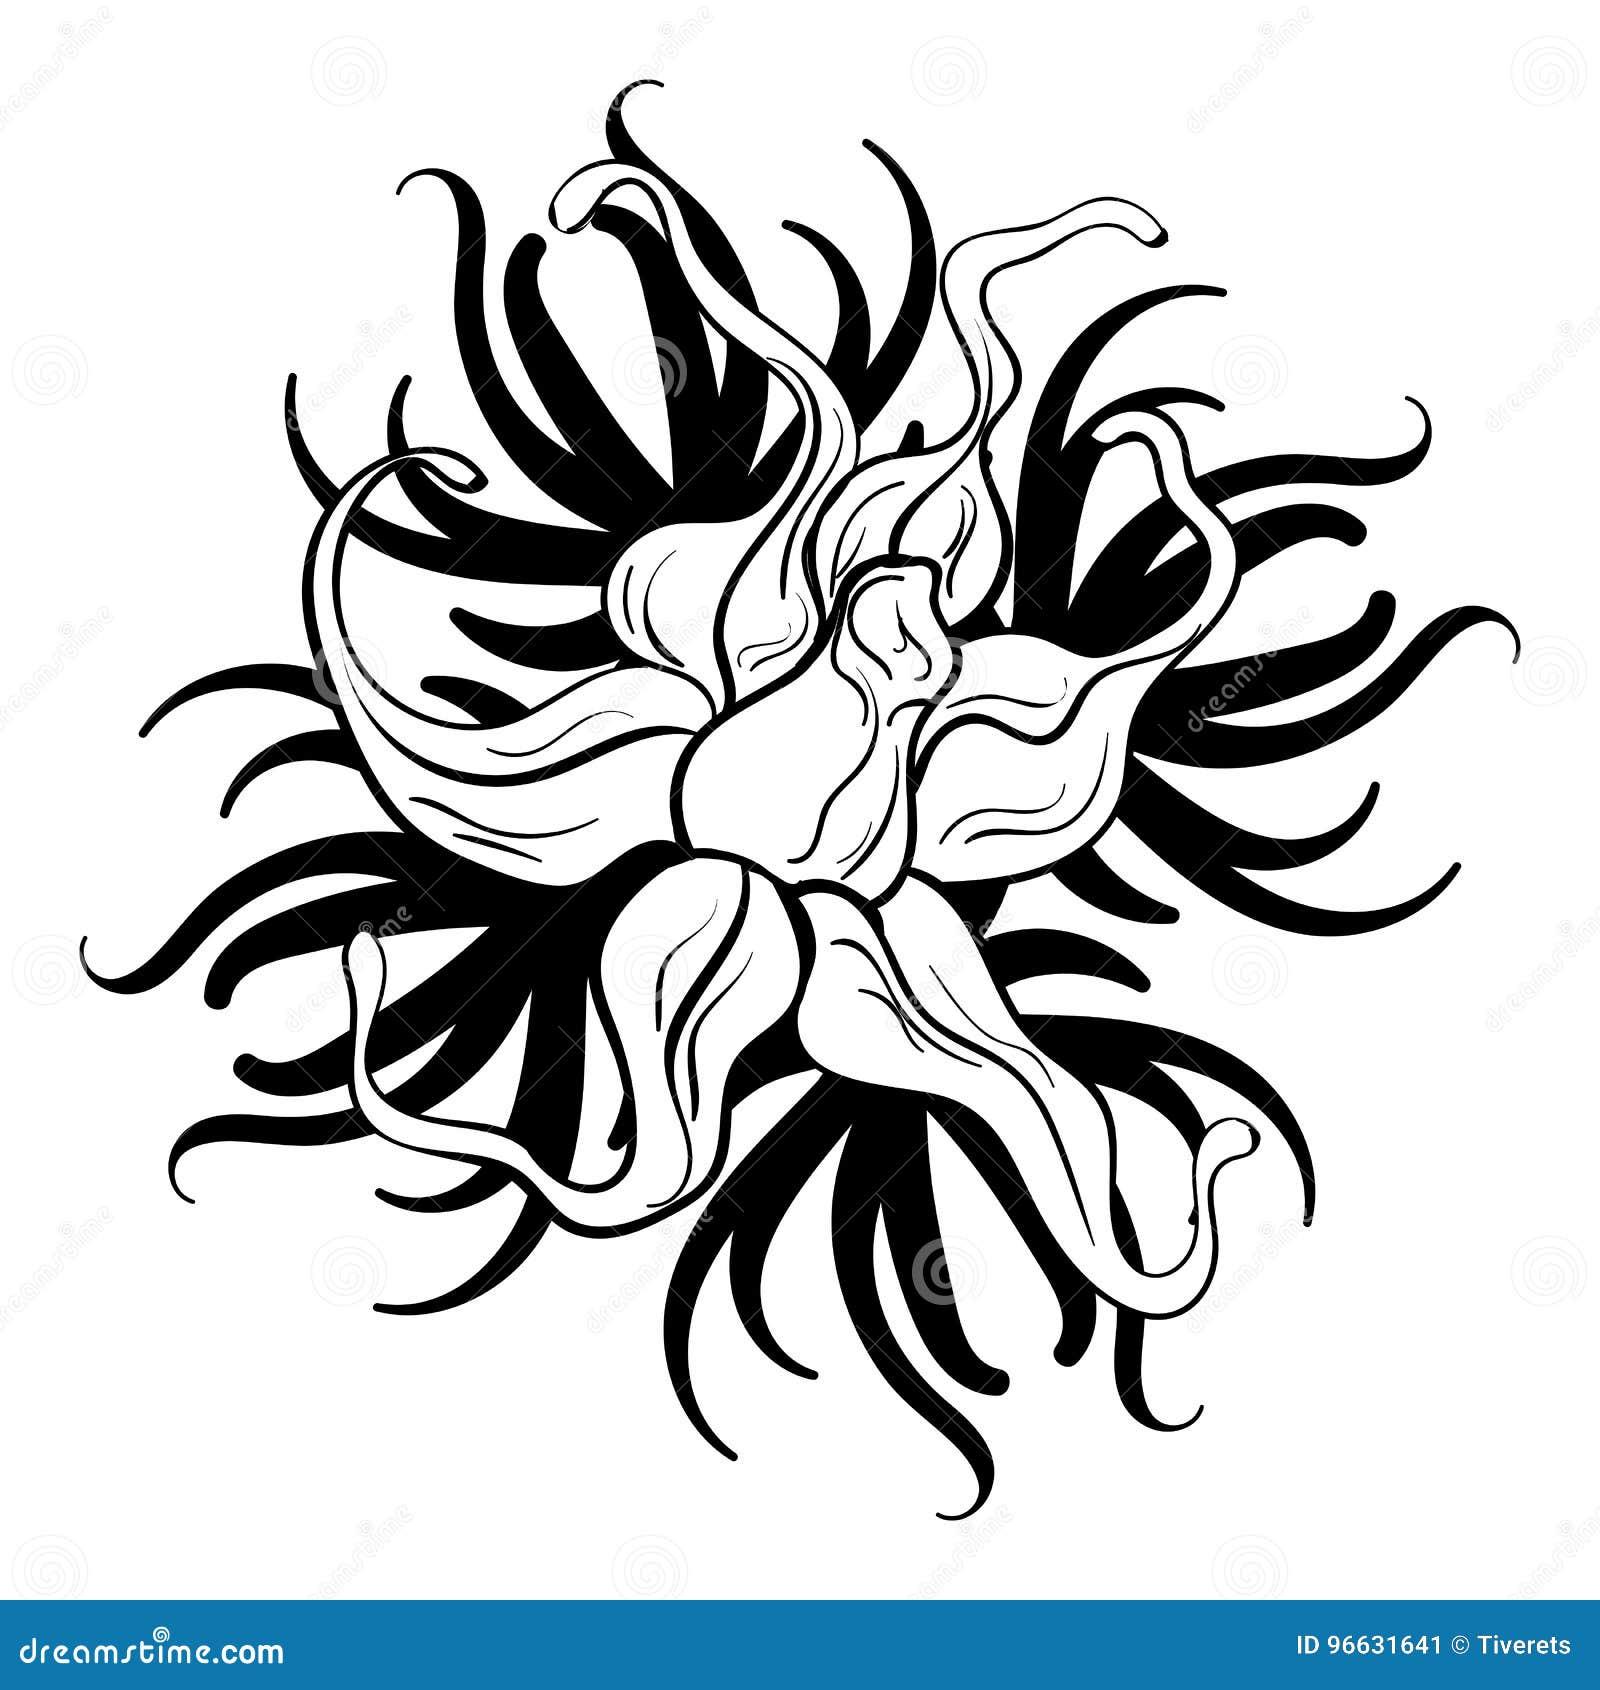 Black And White Flower Tattoo Stock Vector Illustration Of